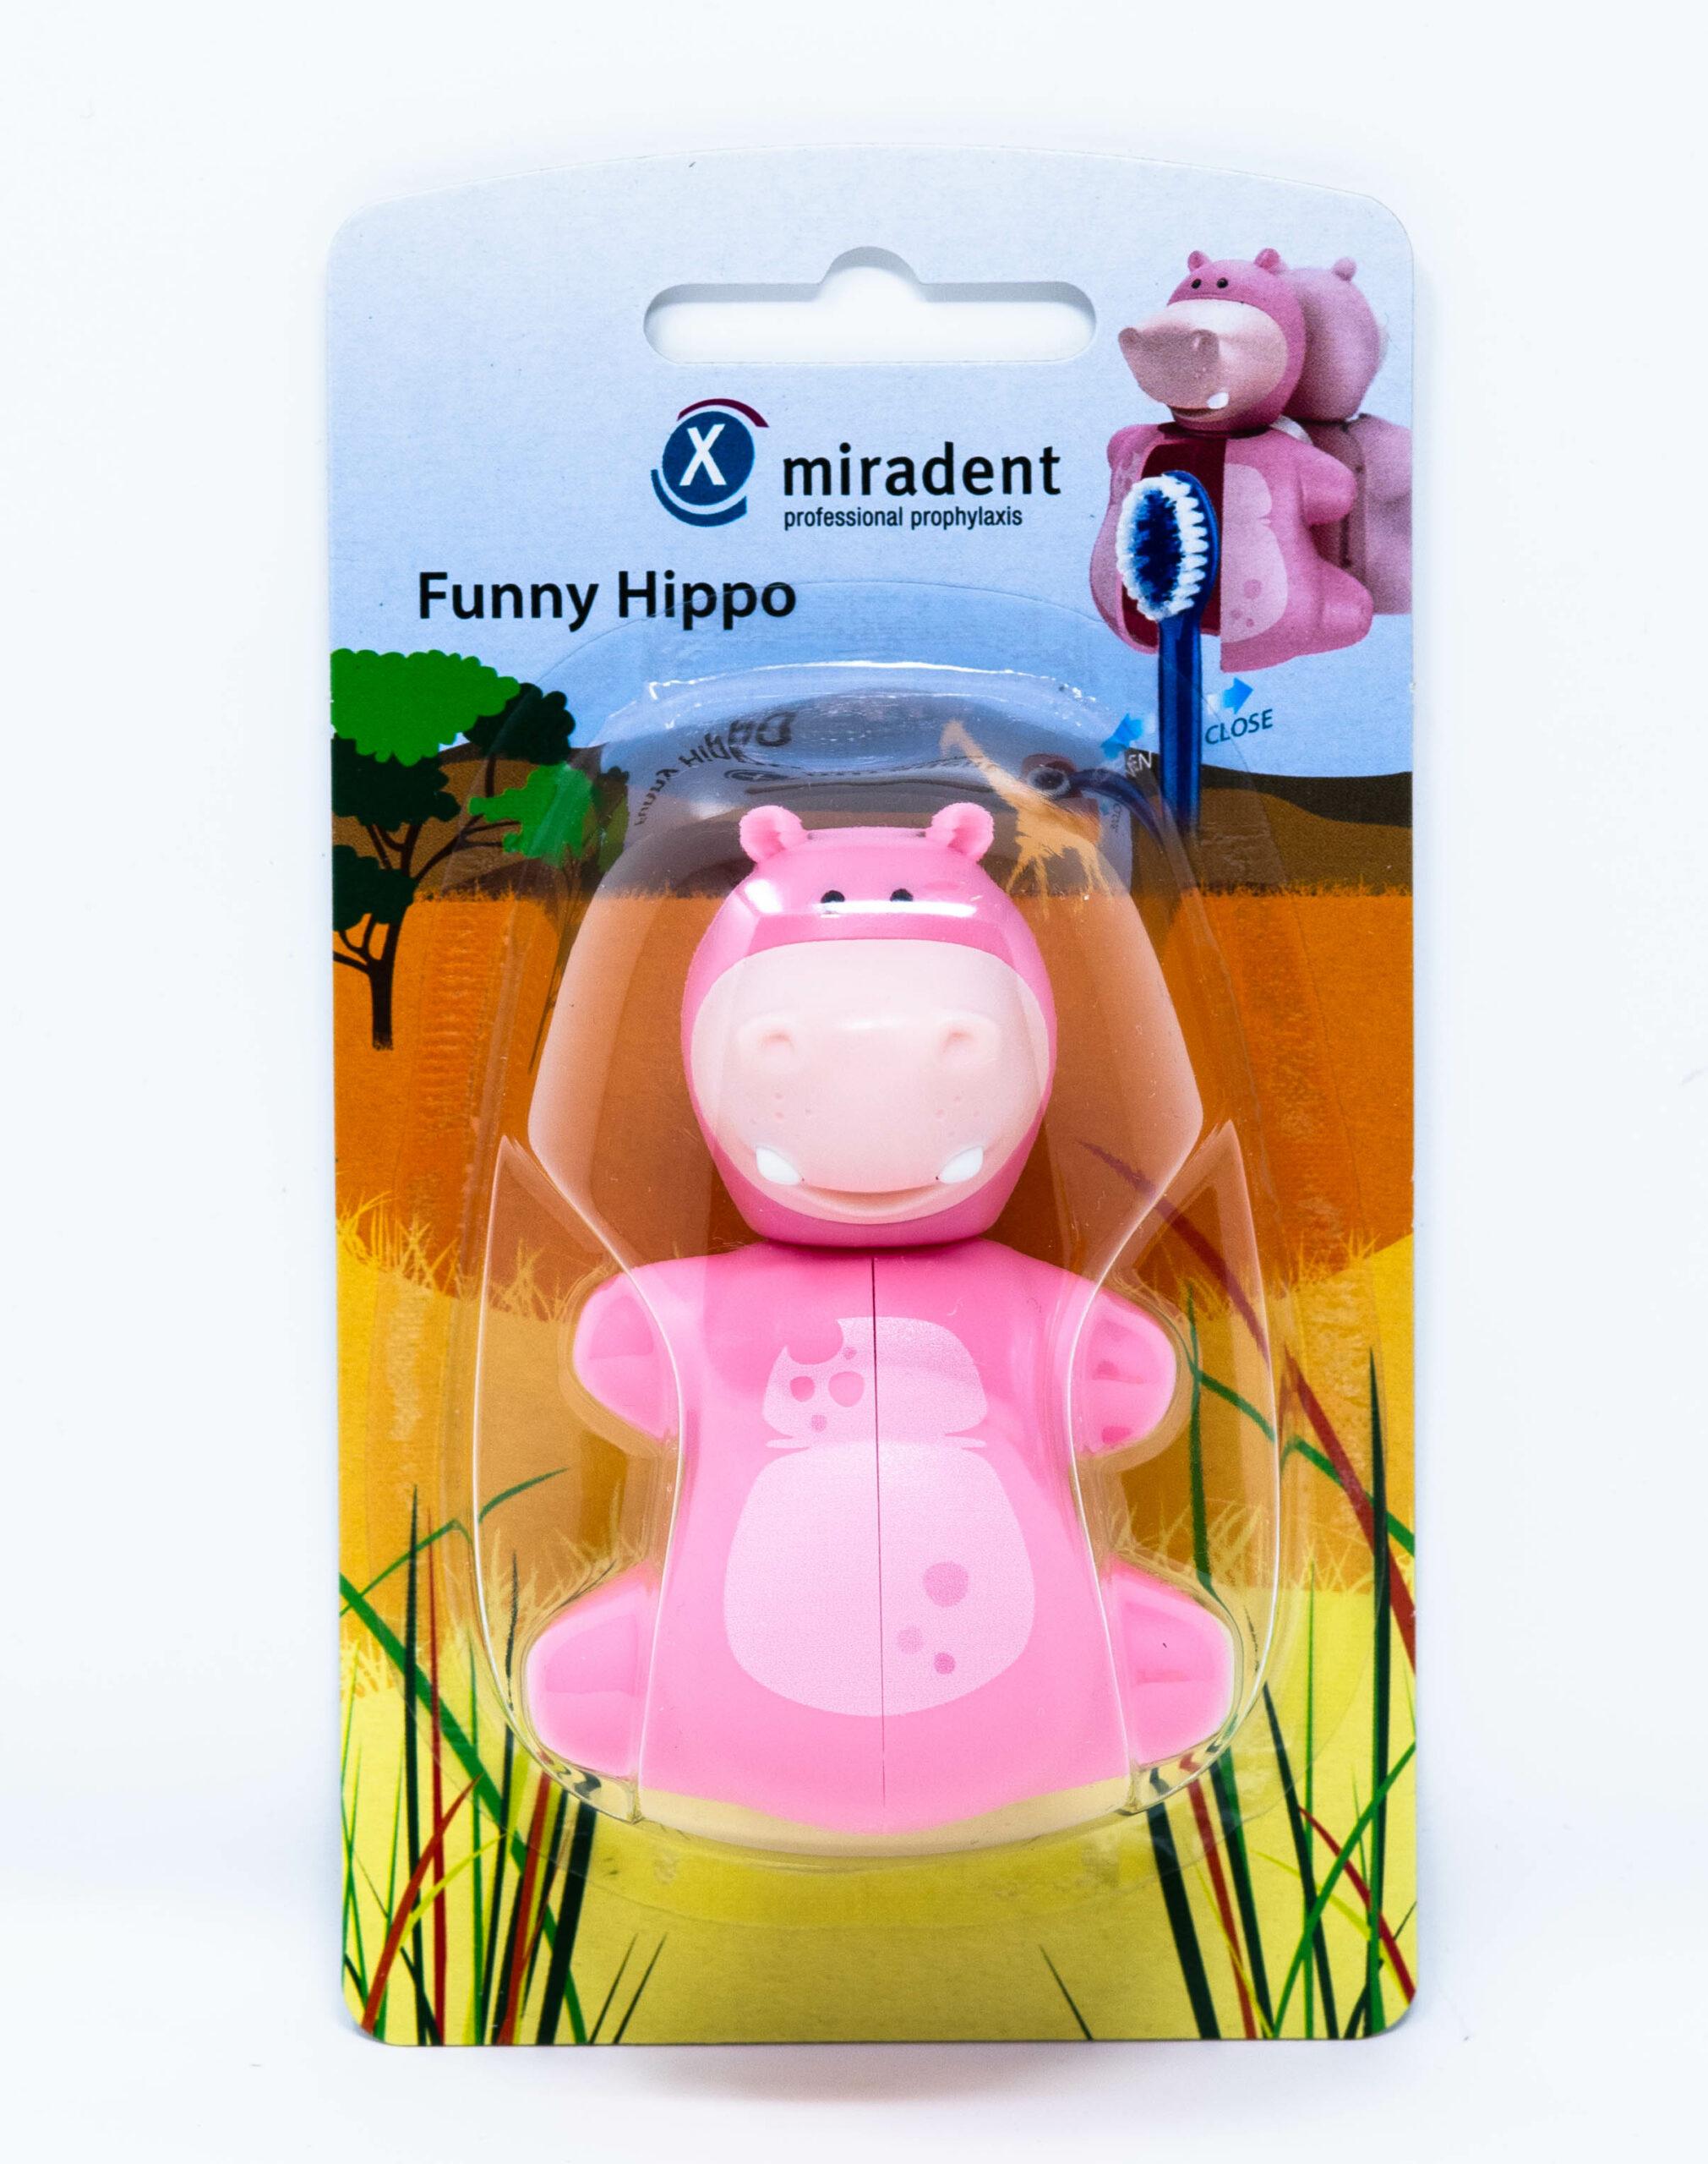 Miradent Porta Spazzolino Hippo - 1 pz